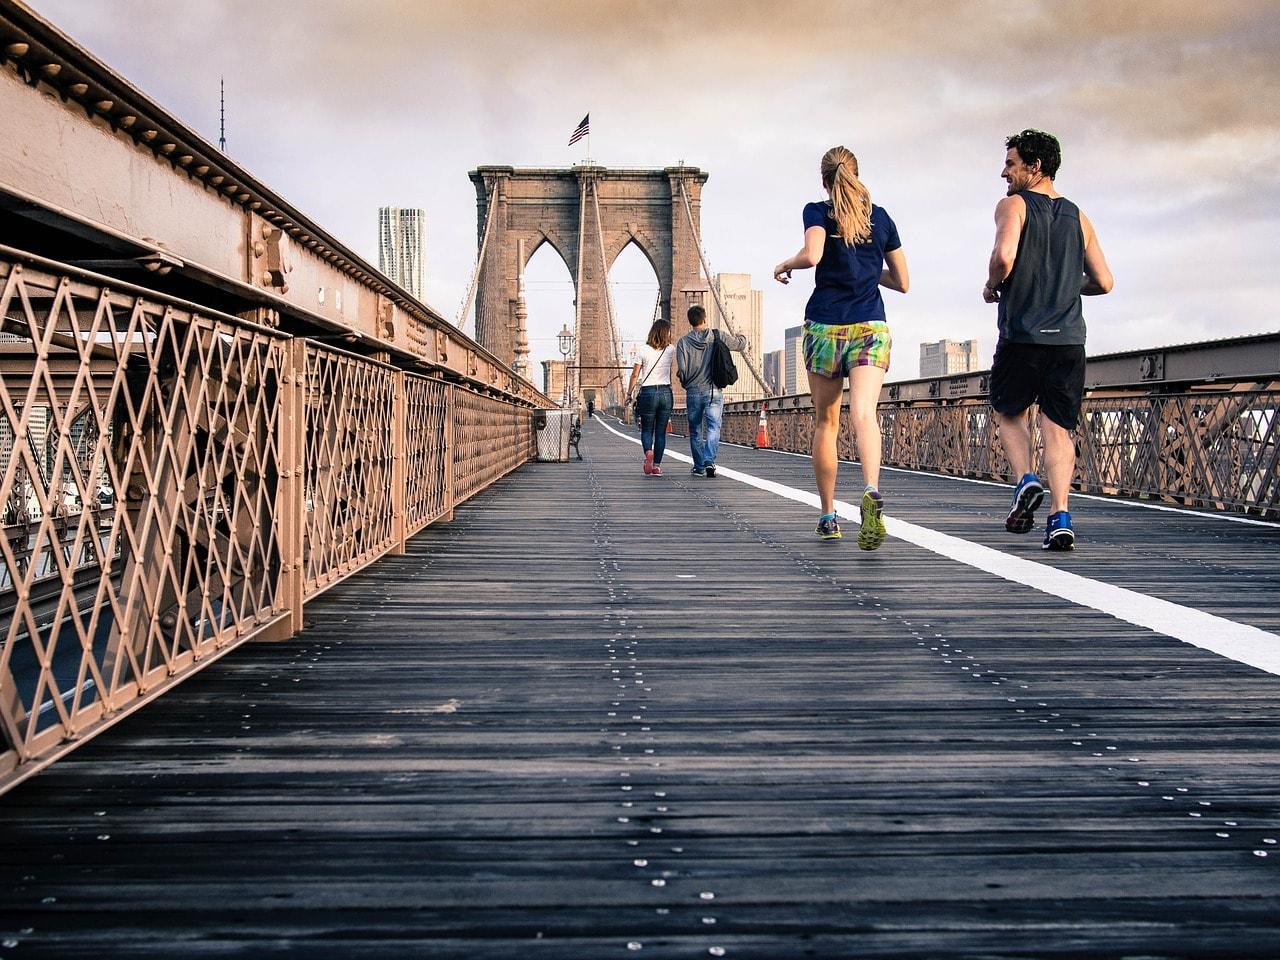 ᐅ Sebastianrenntde ᐅ Jogging Fitness Ernährung Abnehmen